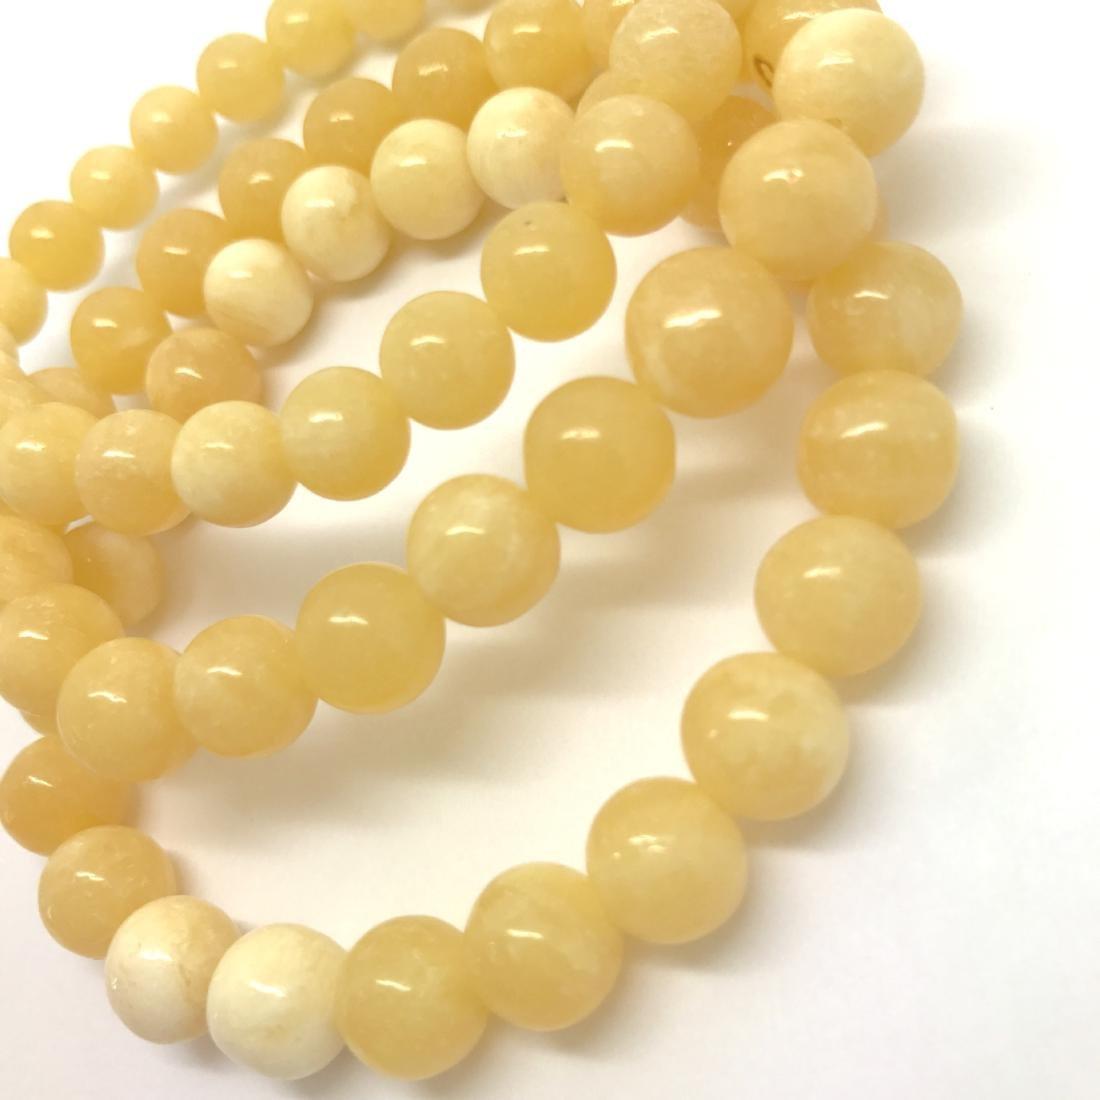 Baltic Jewelry Set x3 Bracelets Yellow-White Colour - 4